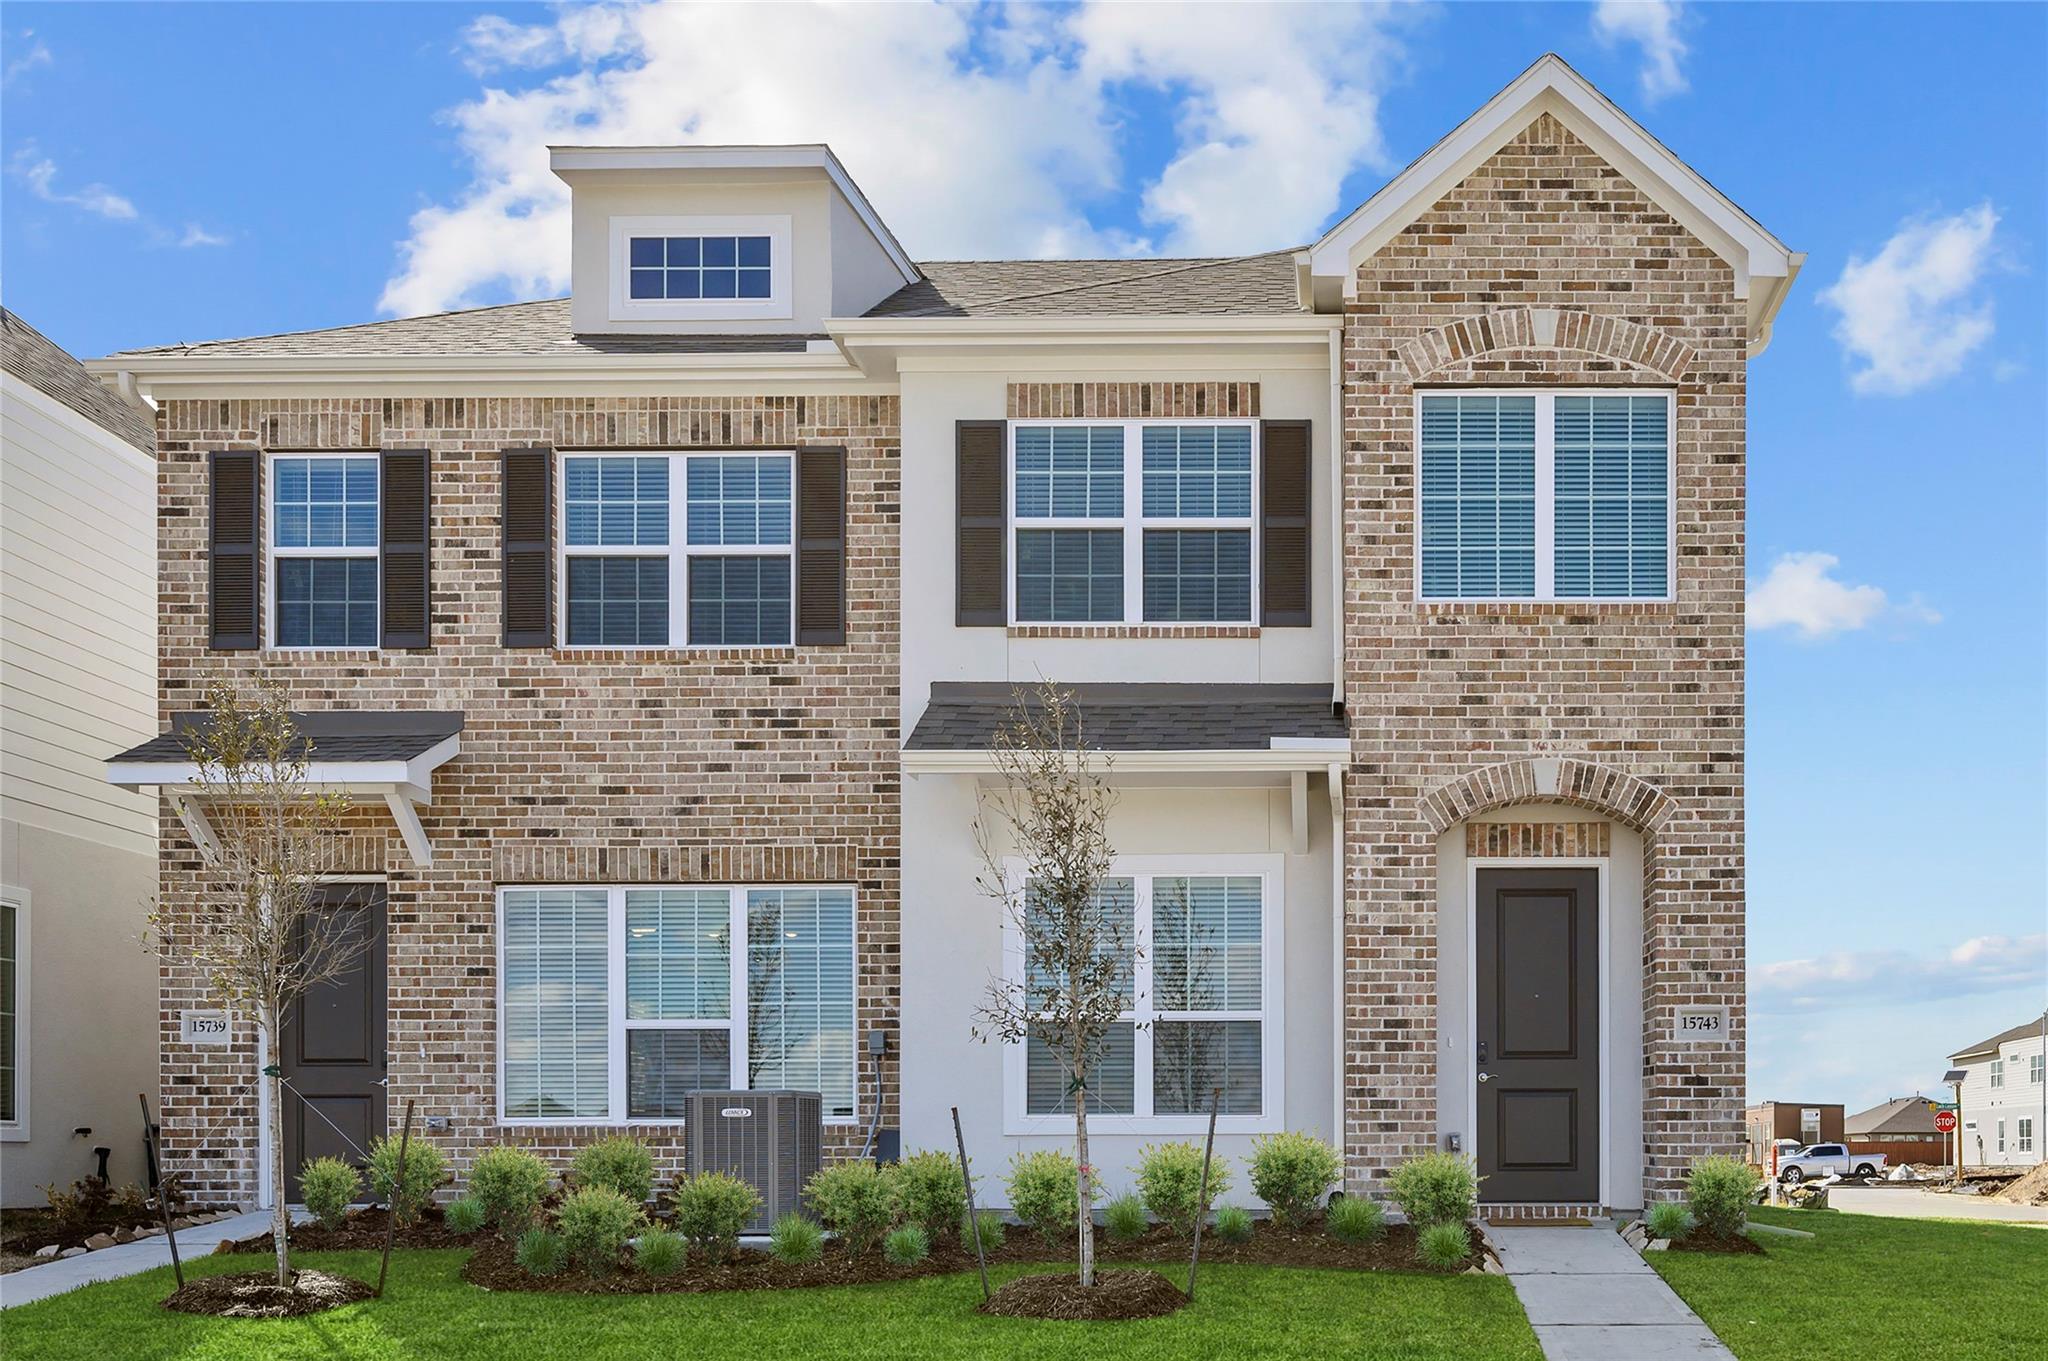 15743 Blair Castle Dr Property Photo - Atascocita, TX real estate listing